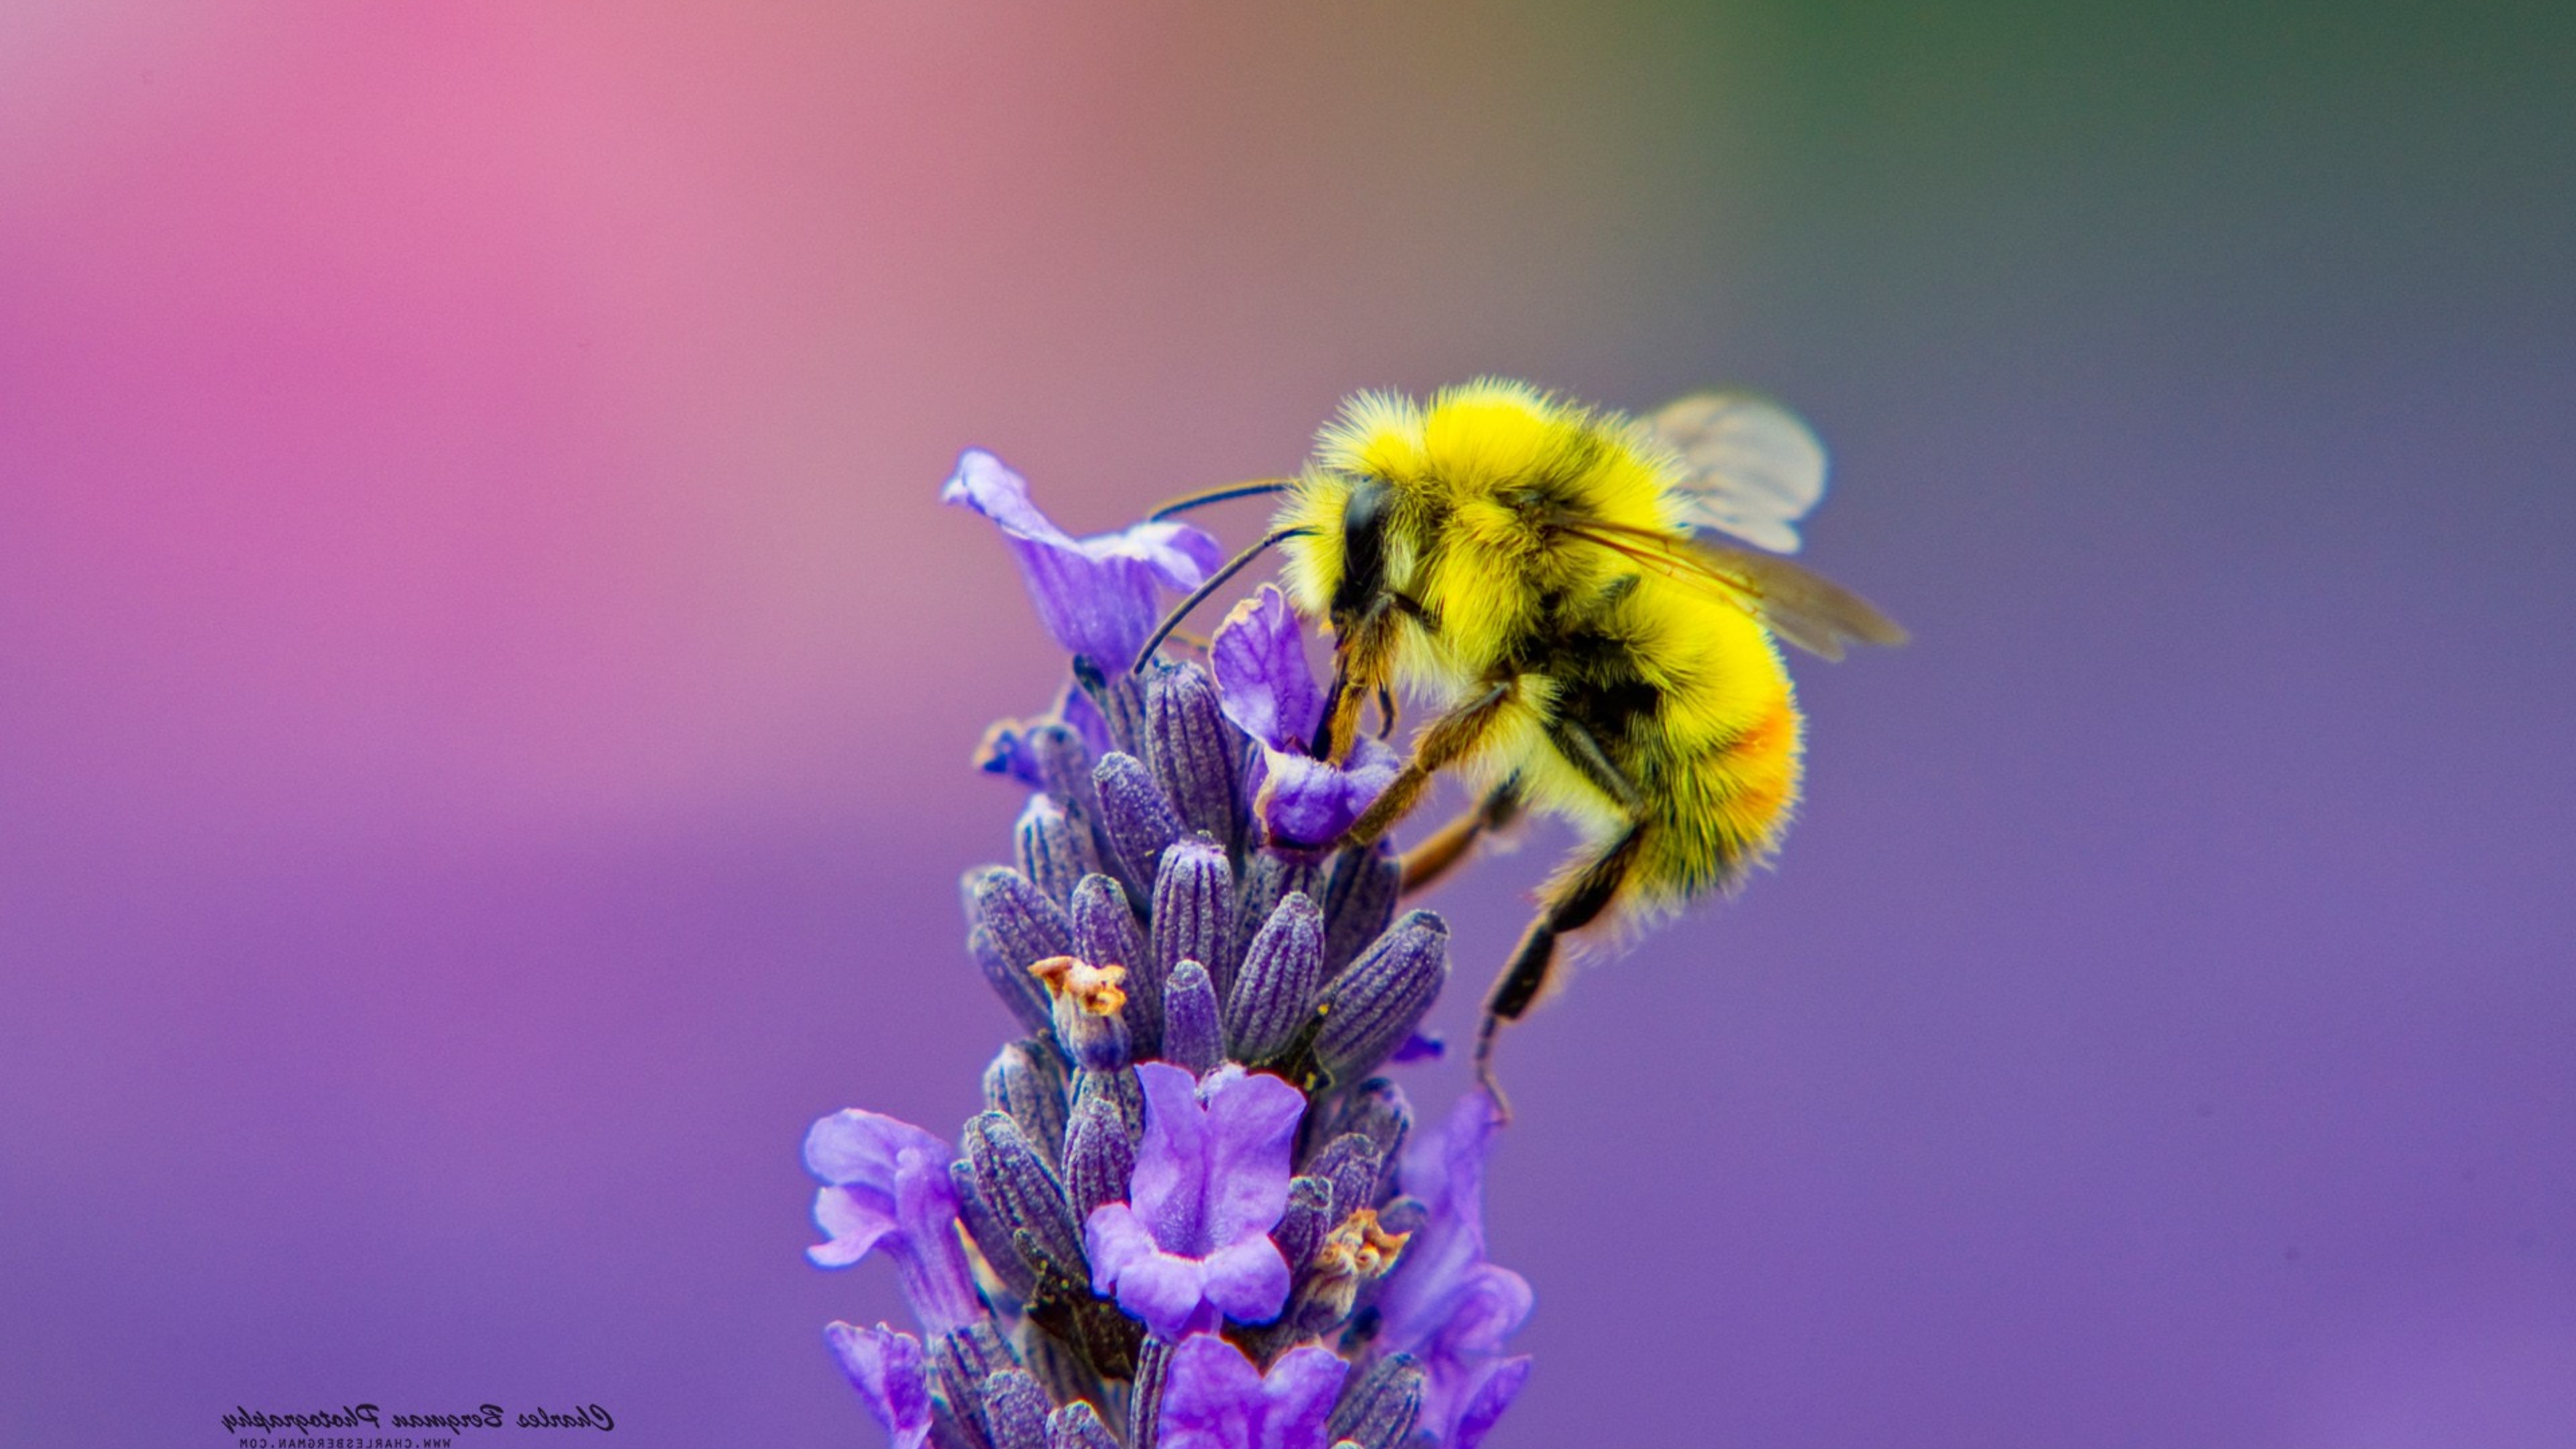 Cute Honey Bee Wallpaper Honey Bee Lavendar Nectar HD ...